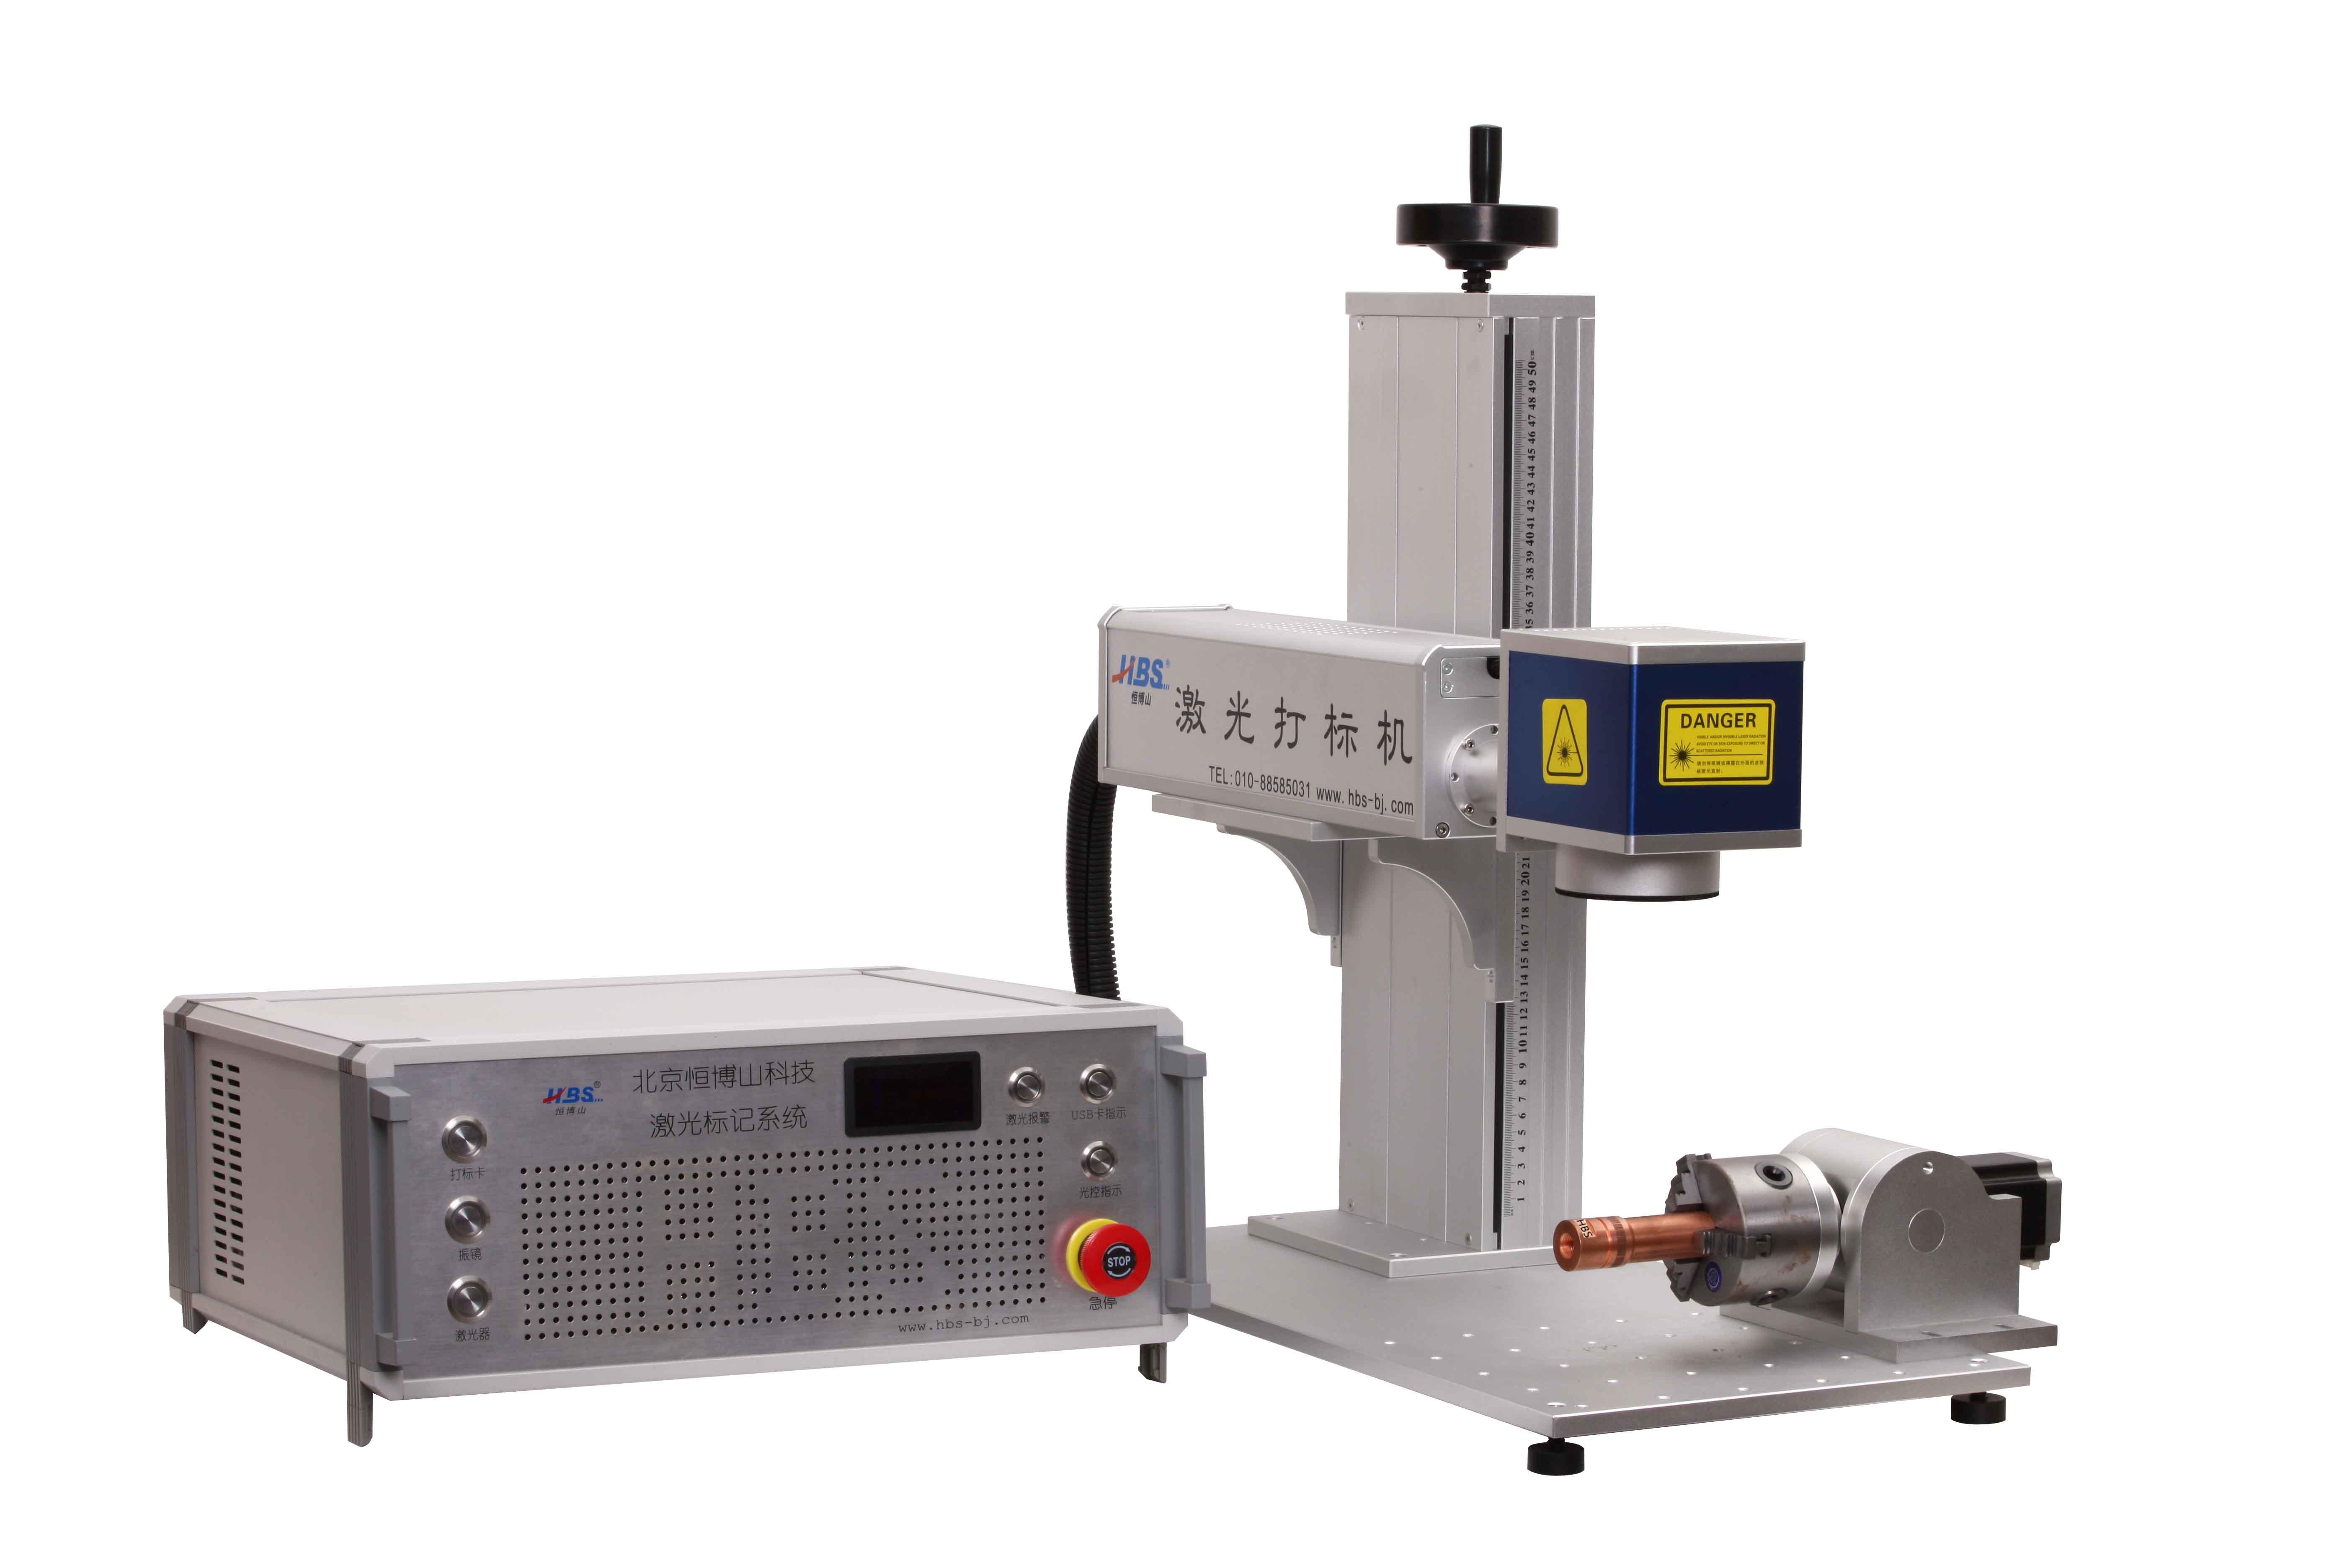 10W Tabletop End Pump Mini Marking Machine